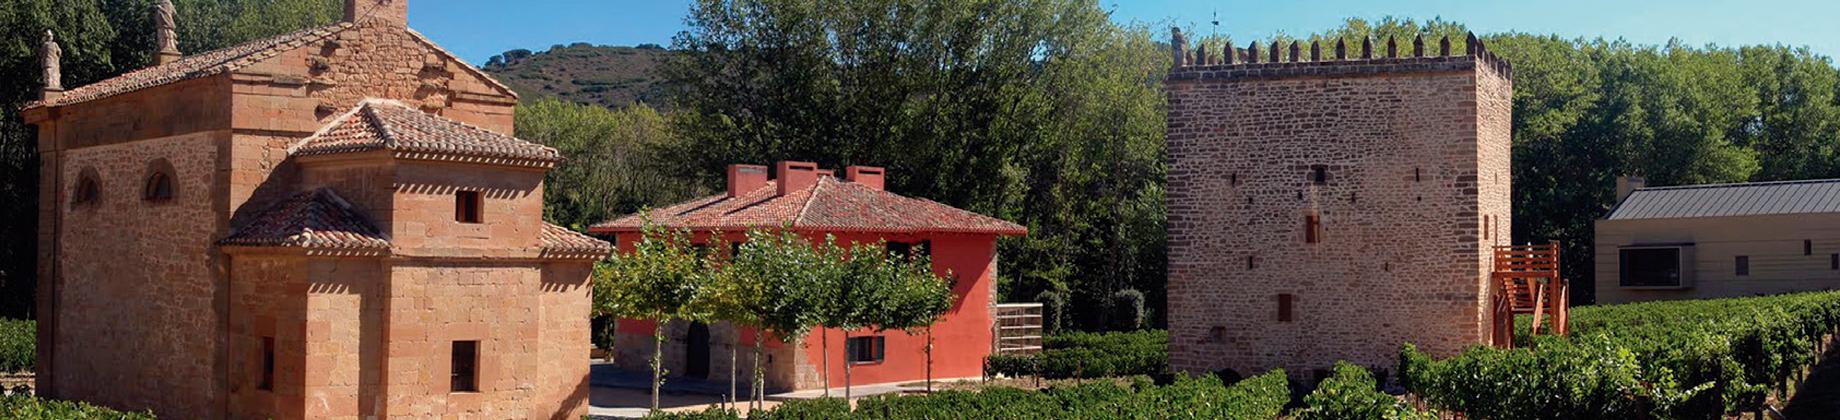 Viaje 'top' a Navarra: naturaleza, bodegas y gastronomía con estrella Michelin